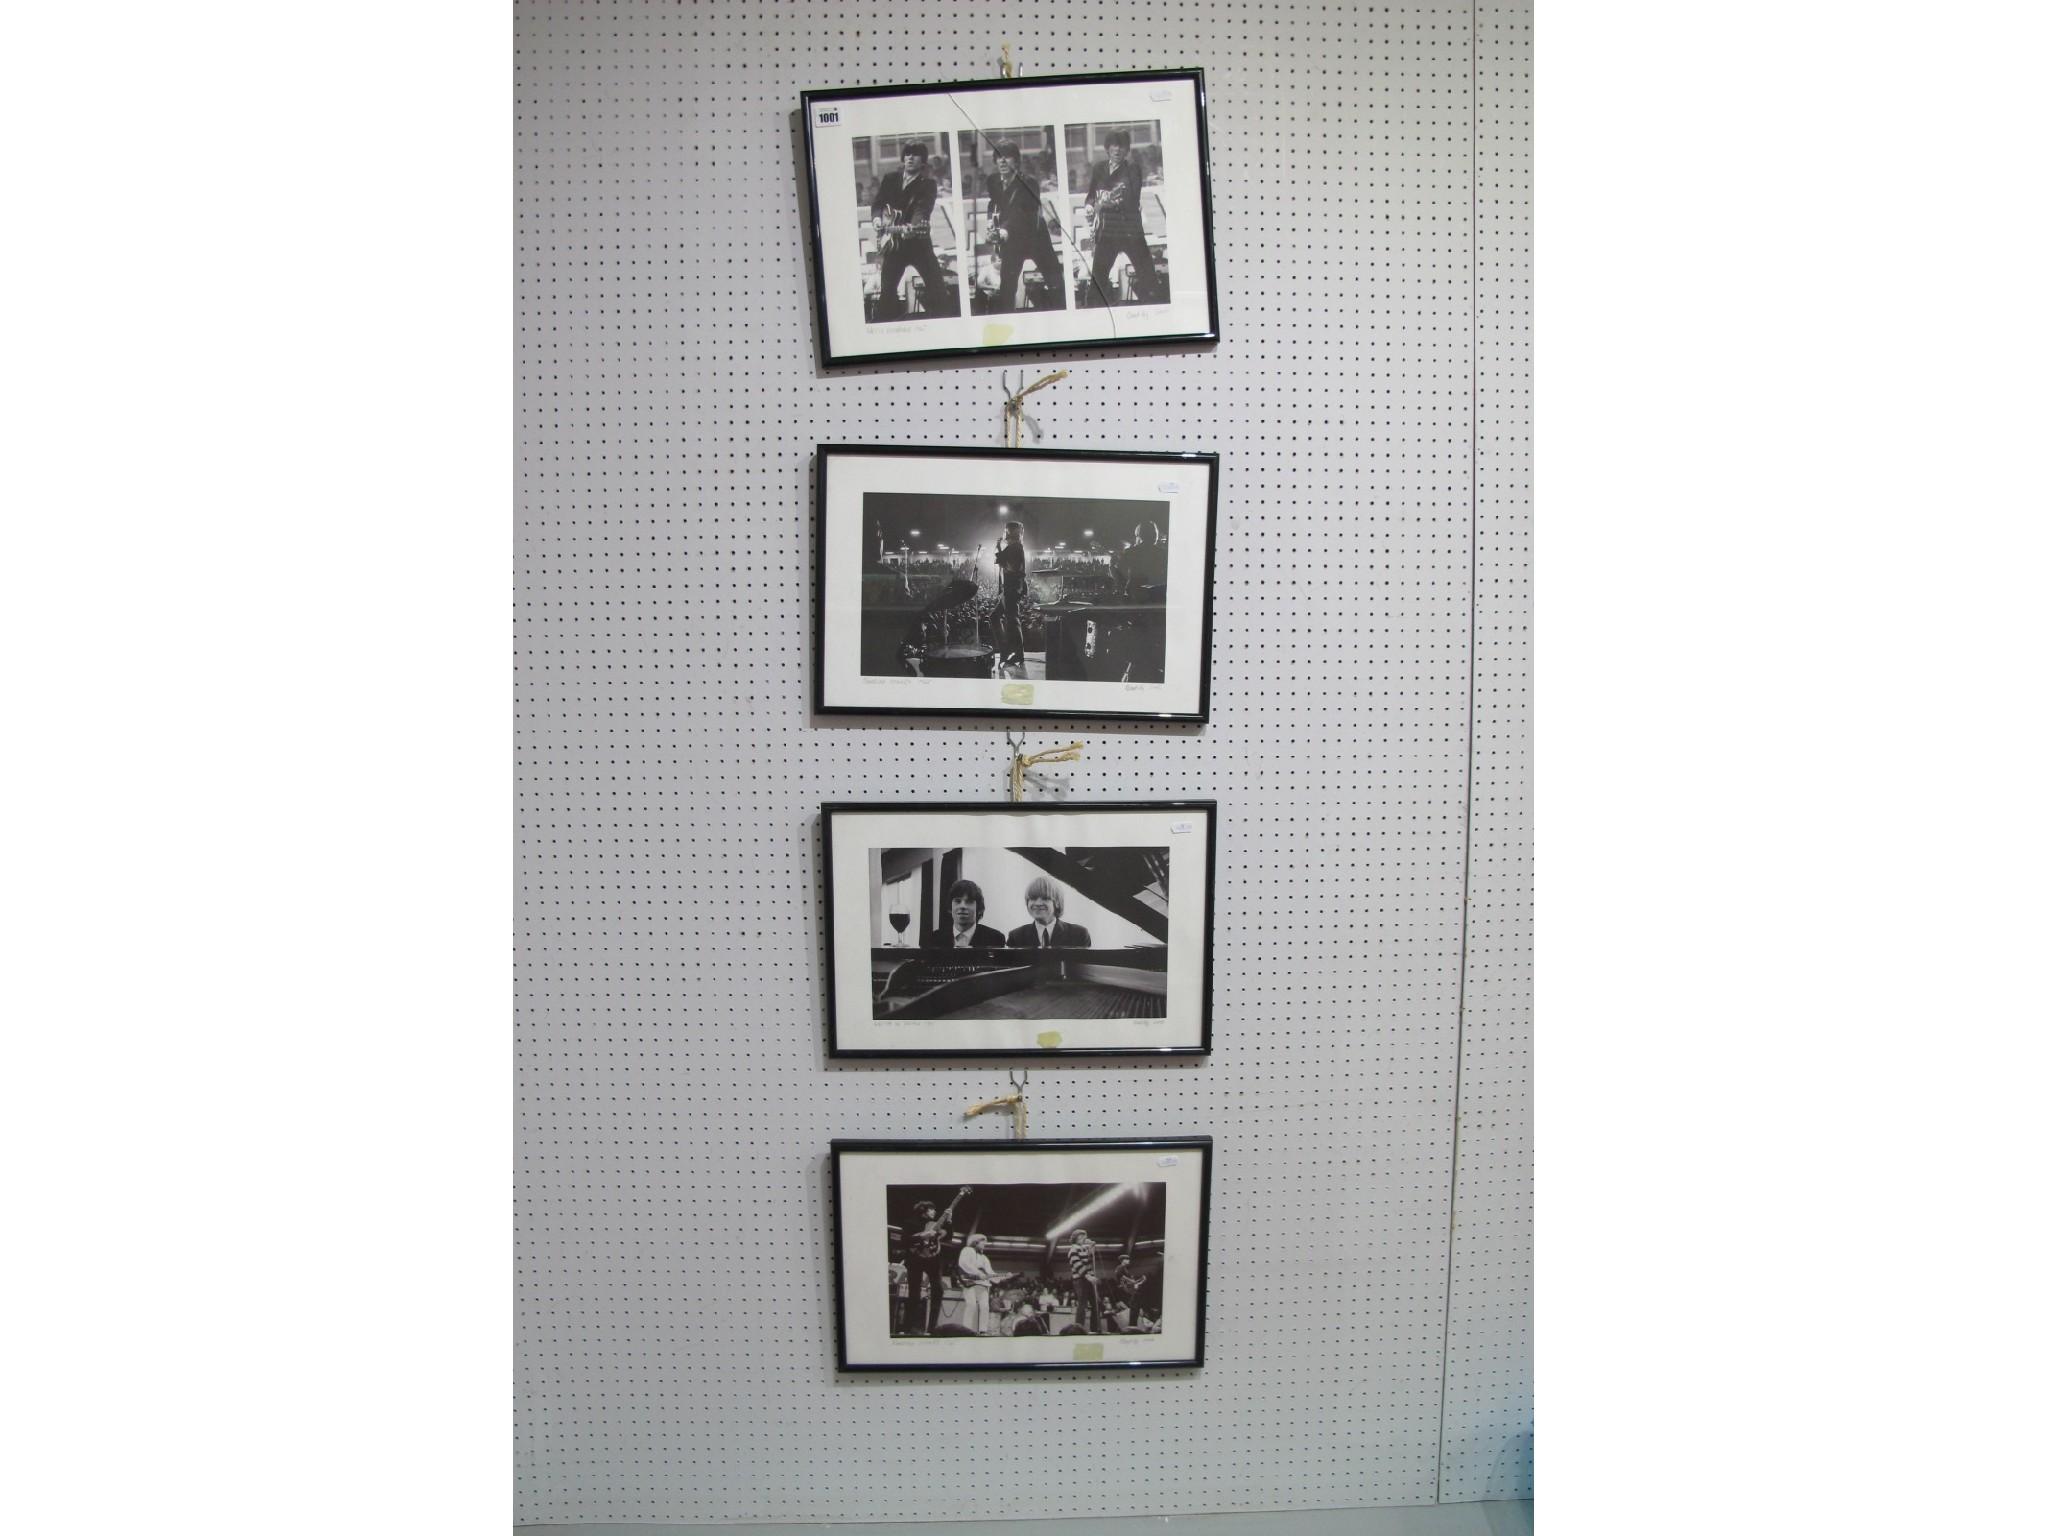 Vinyl Records & Music Ephemera Auction